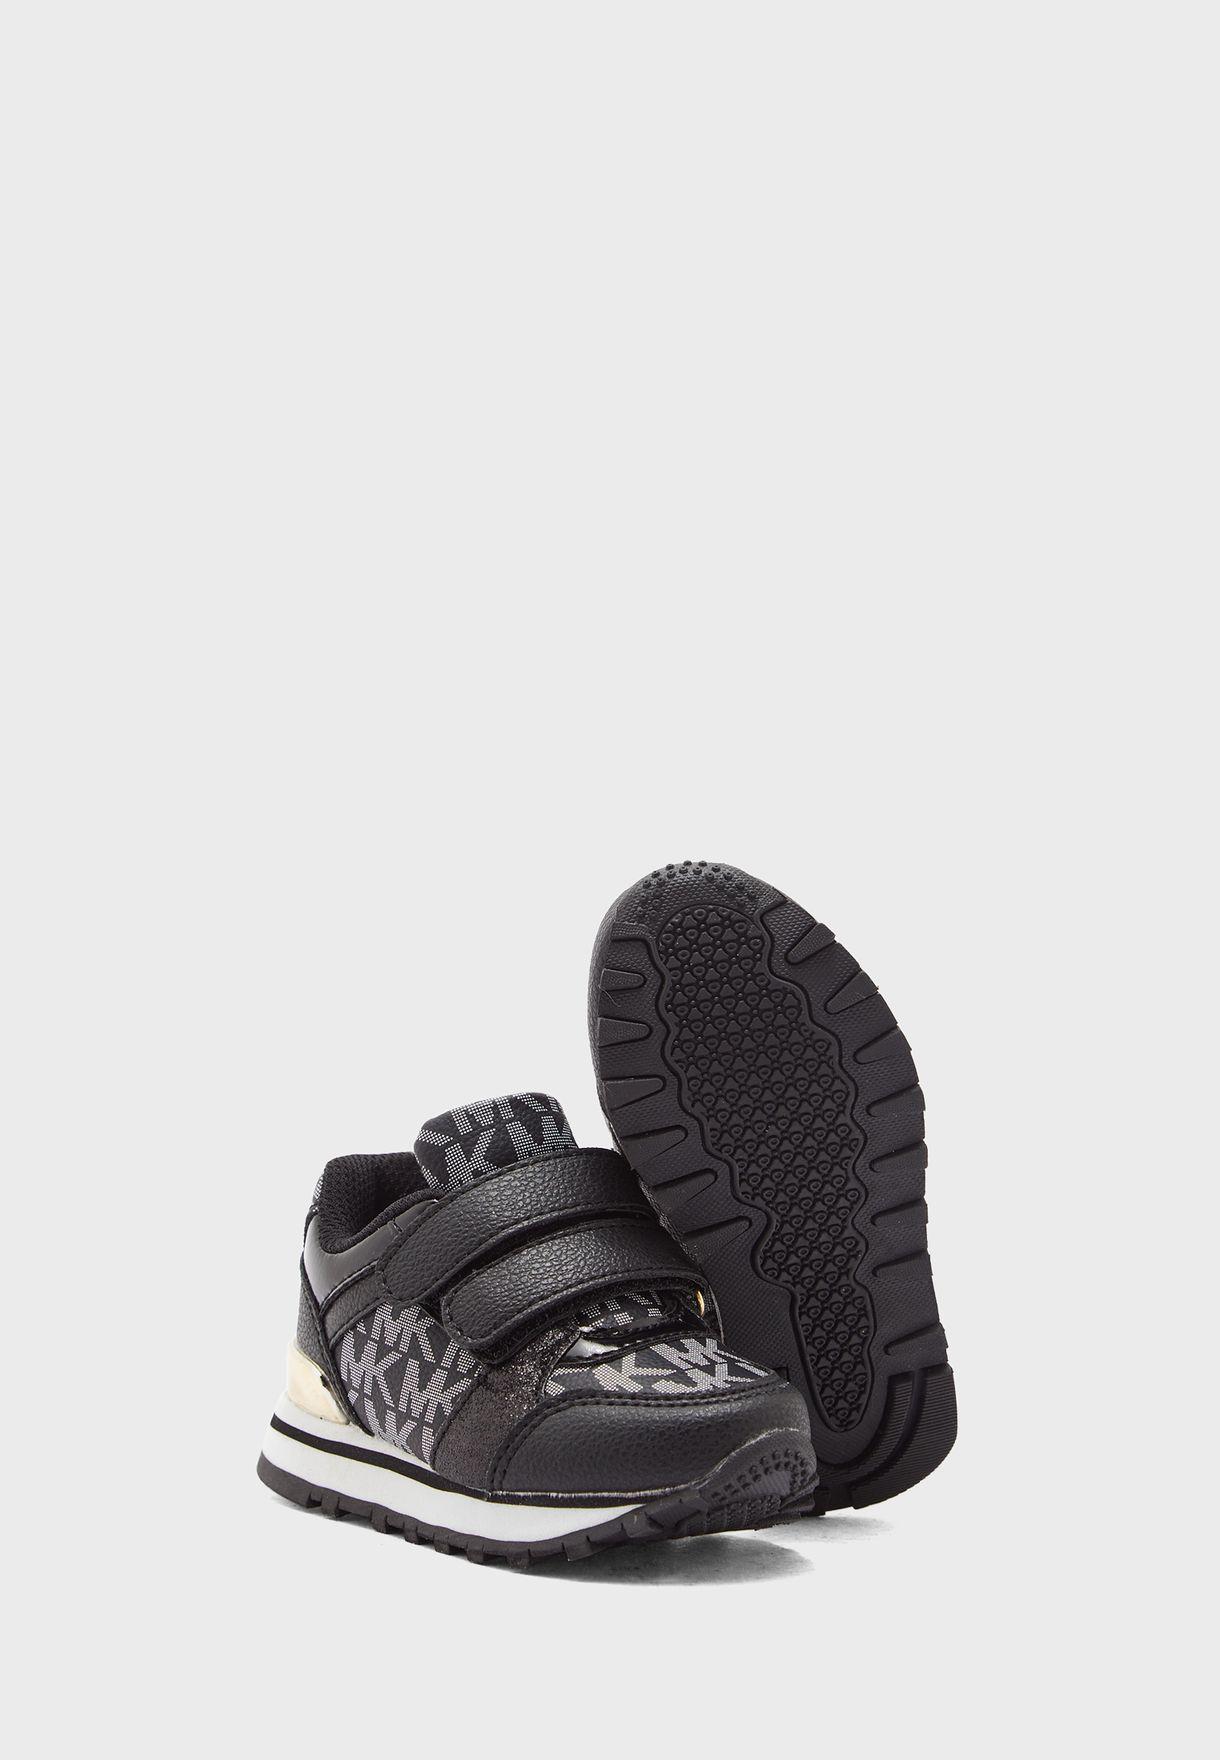 Billie Jogger Low Top Sneakers